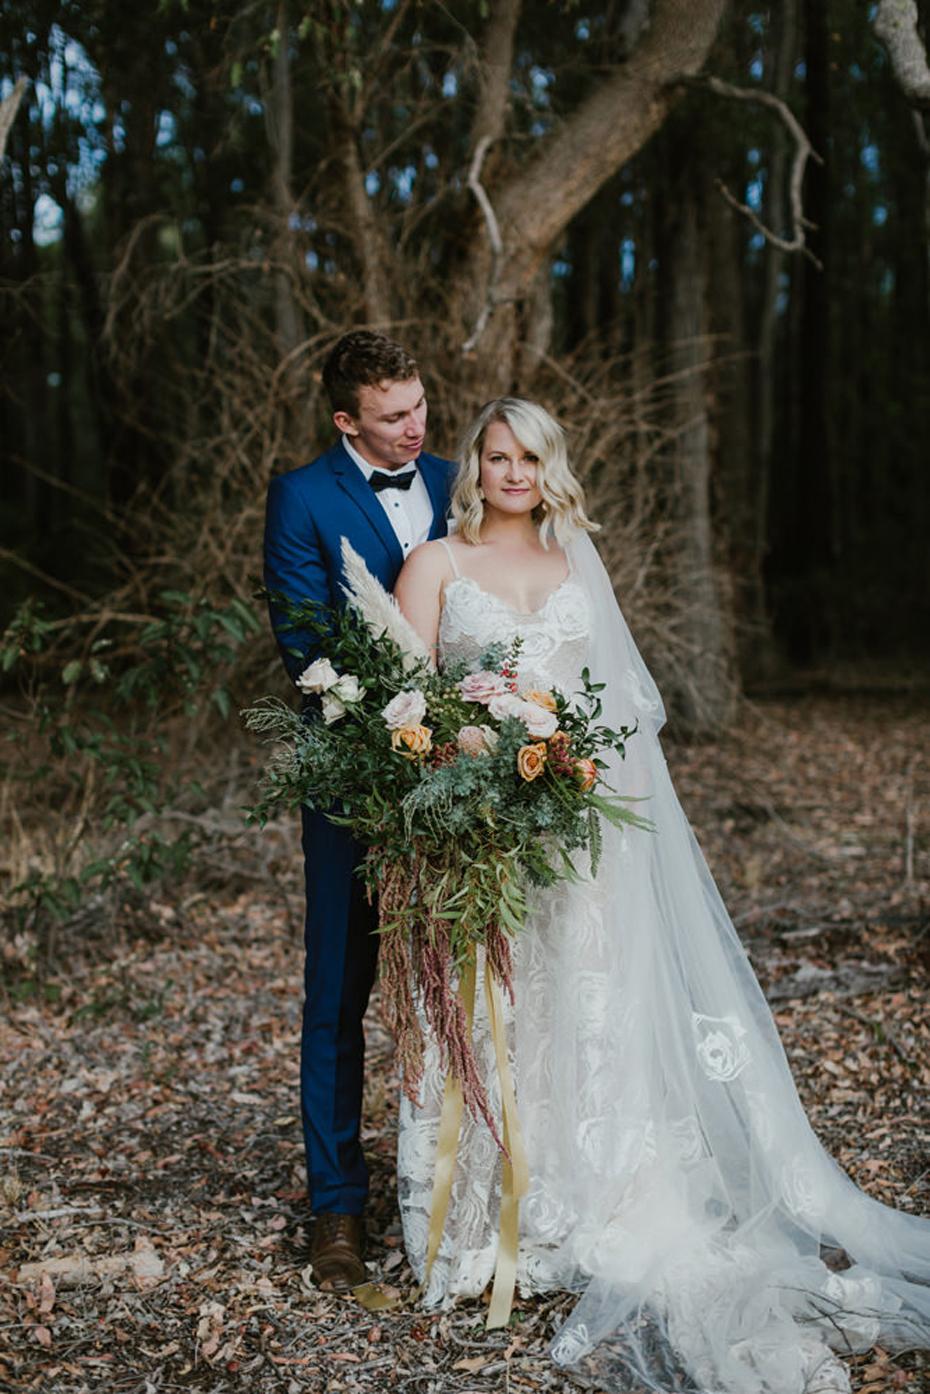 014-mornington-springs-wedding.jpg